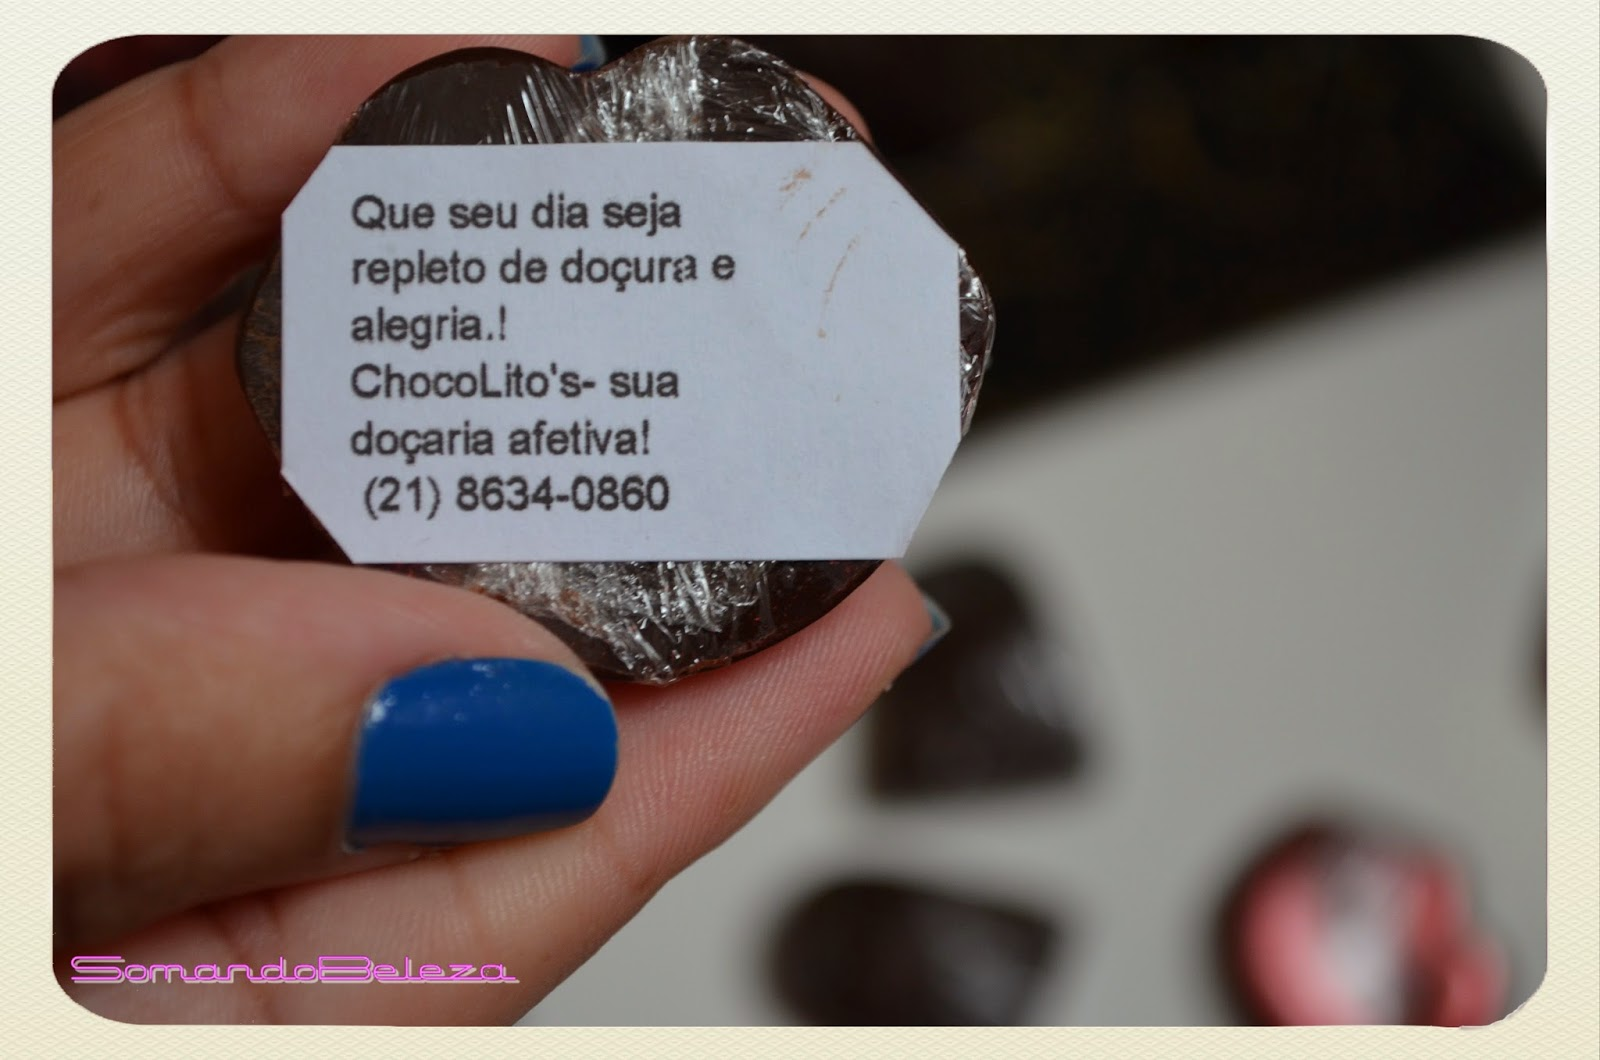 Somando Beleza, Neiva Marins, Chocolito's